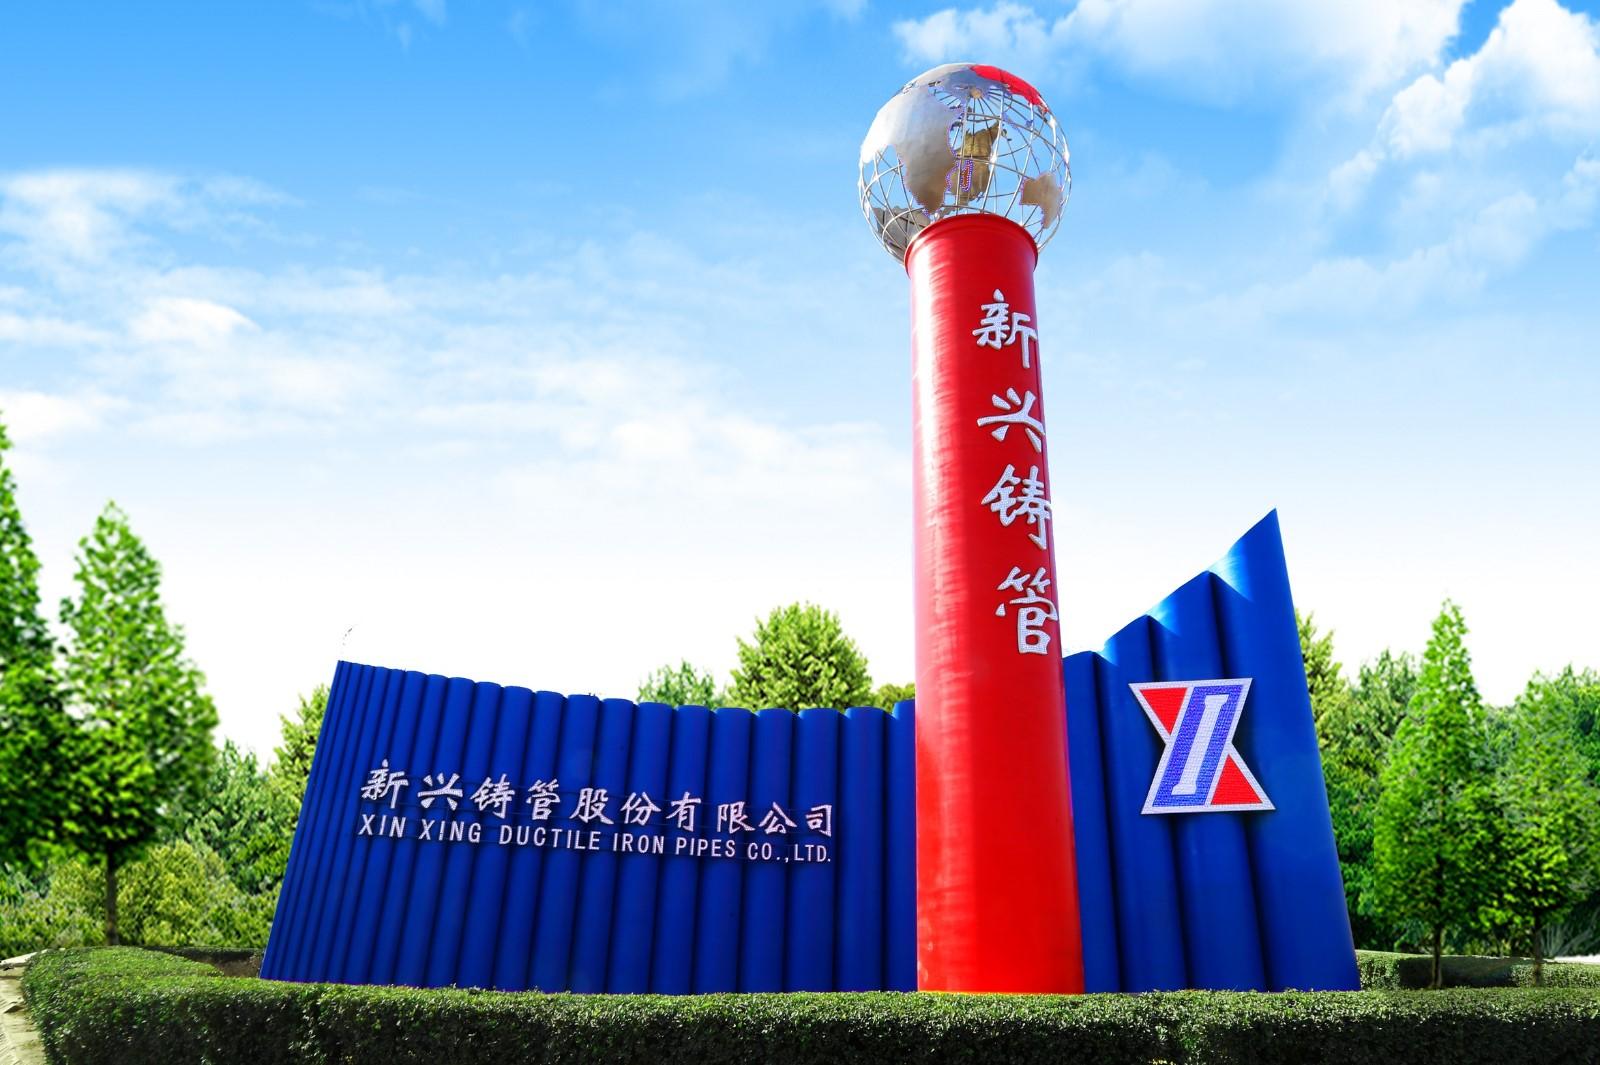 Xinxing Ductile Iron Pipes Co., Ltd.